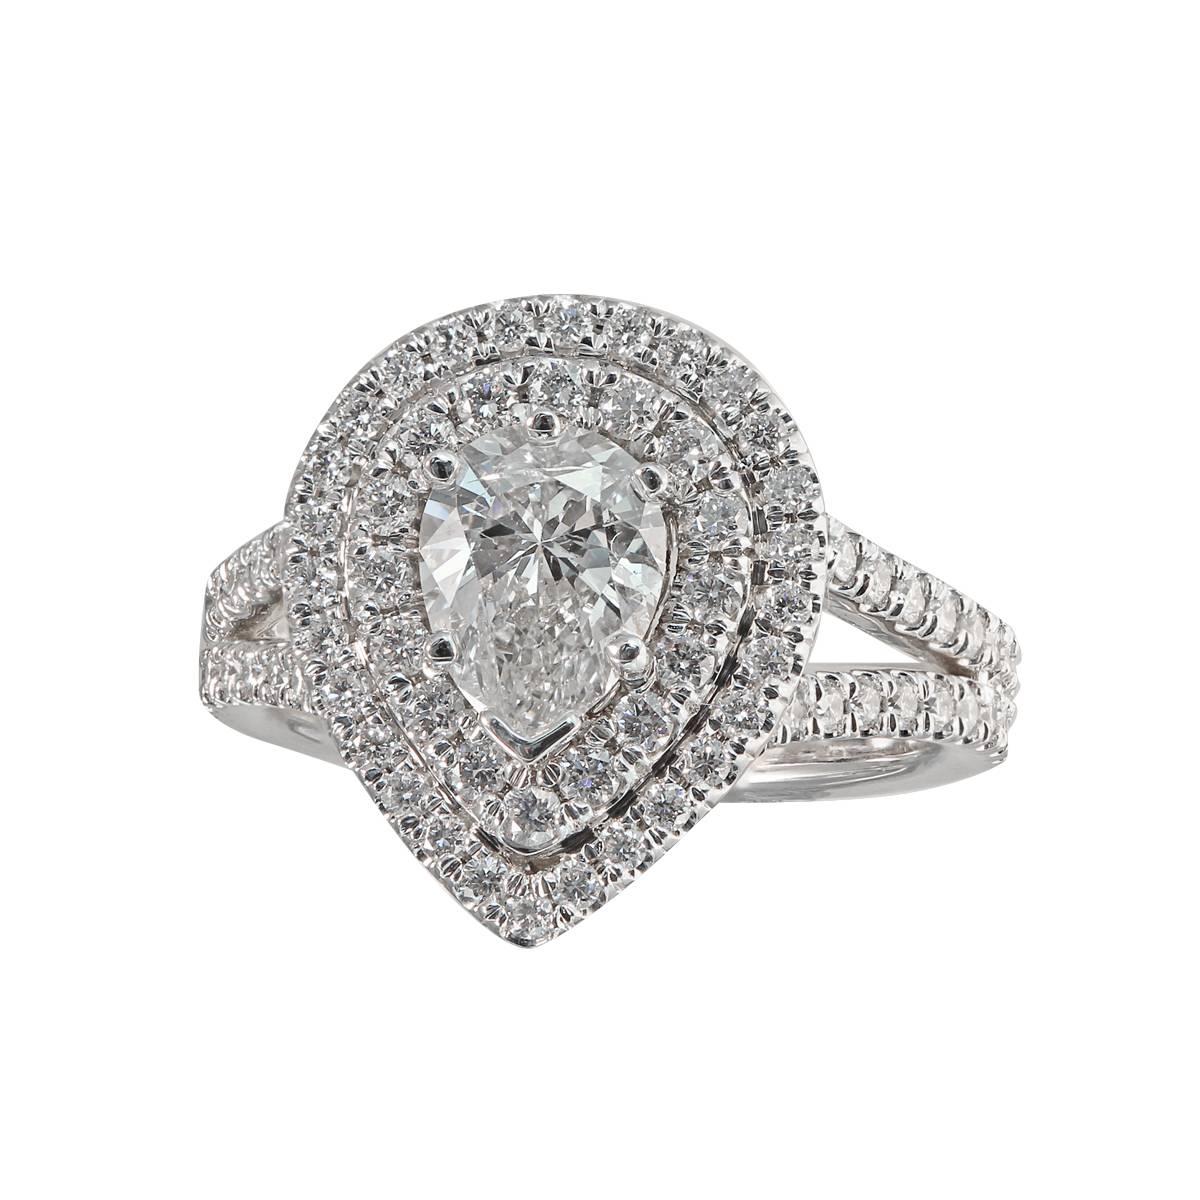 Custom Jewelry Design Engagement Rings In Carlsbad , Encinitas With Custom Design Wedding Rings (View 14 of 15)